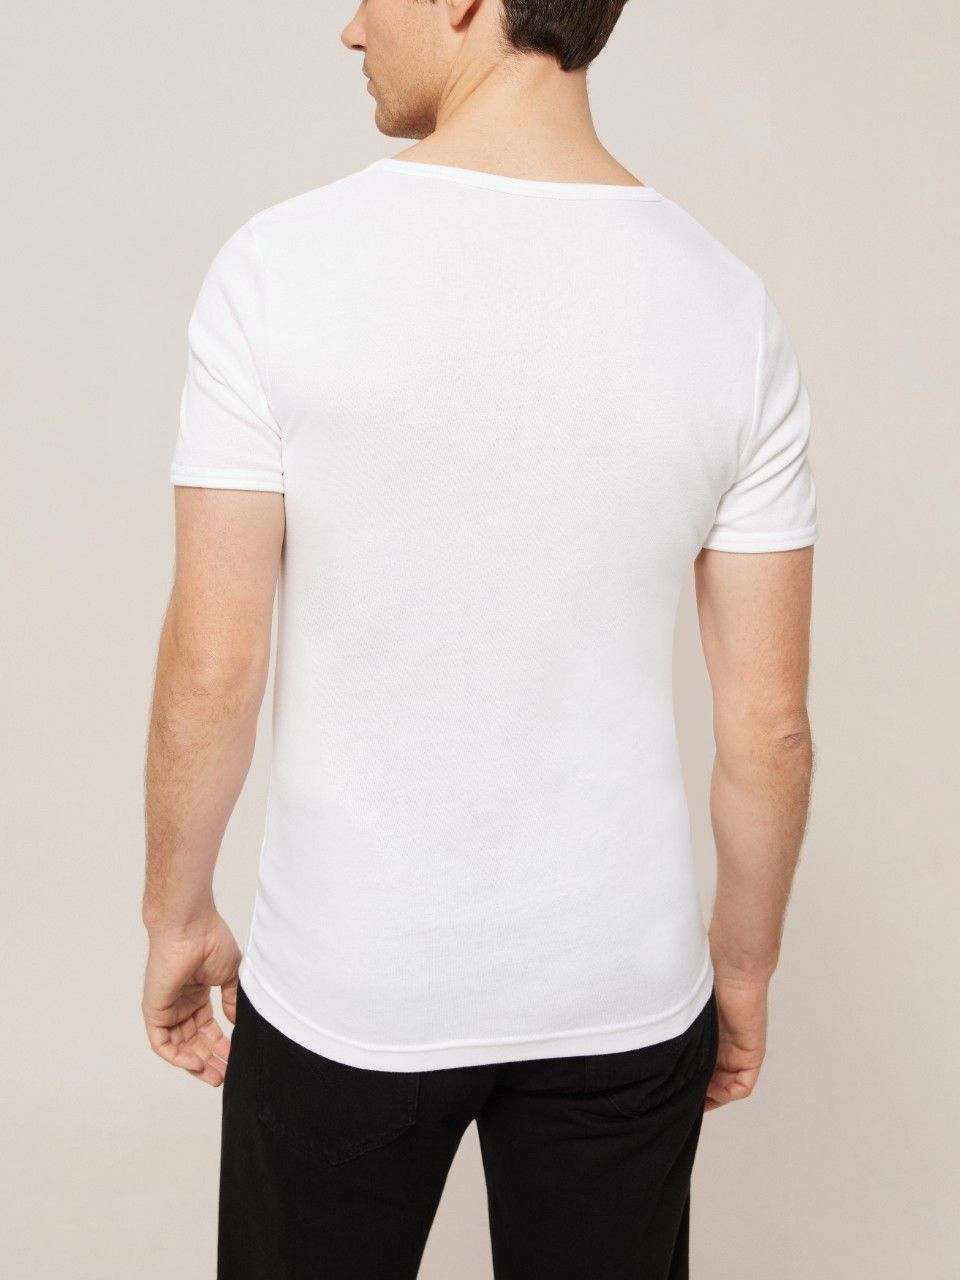 John Lewis & Partners John Lewis & Partners Organic Cotton T-Shirt Vest, Pack of 2, White